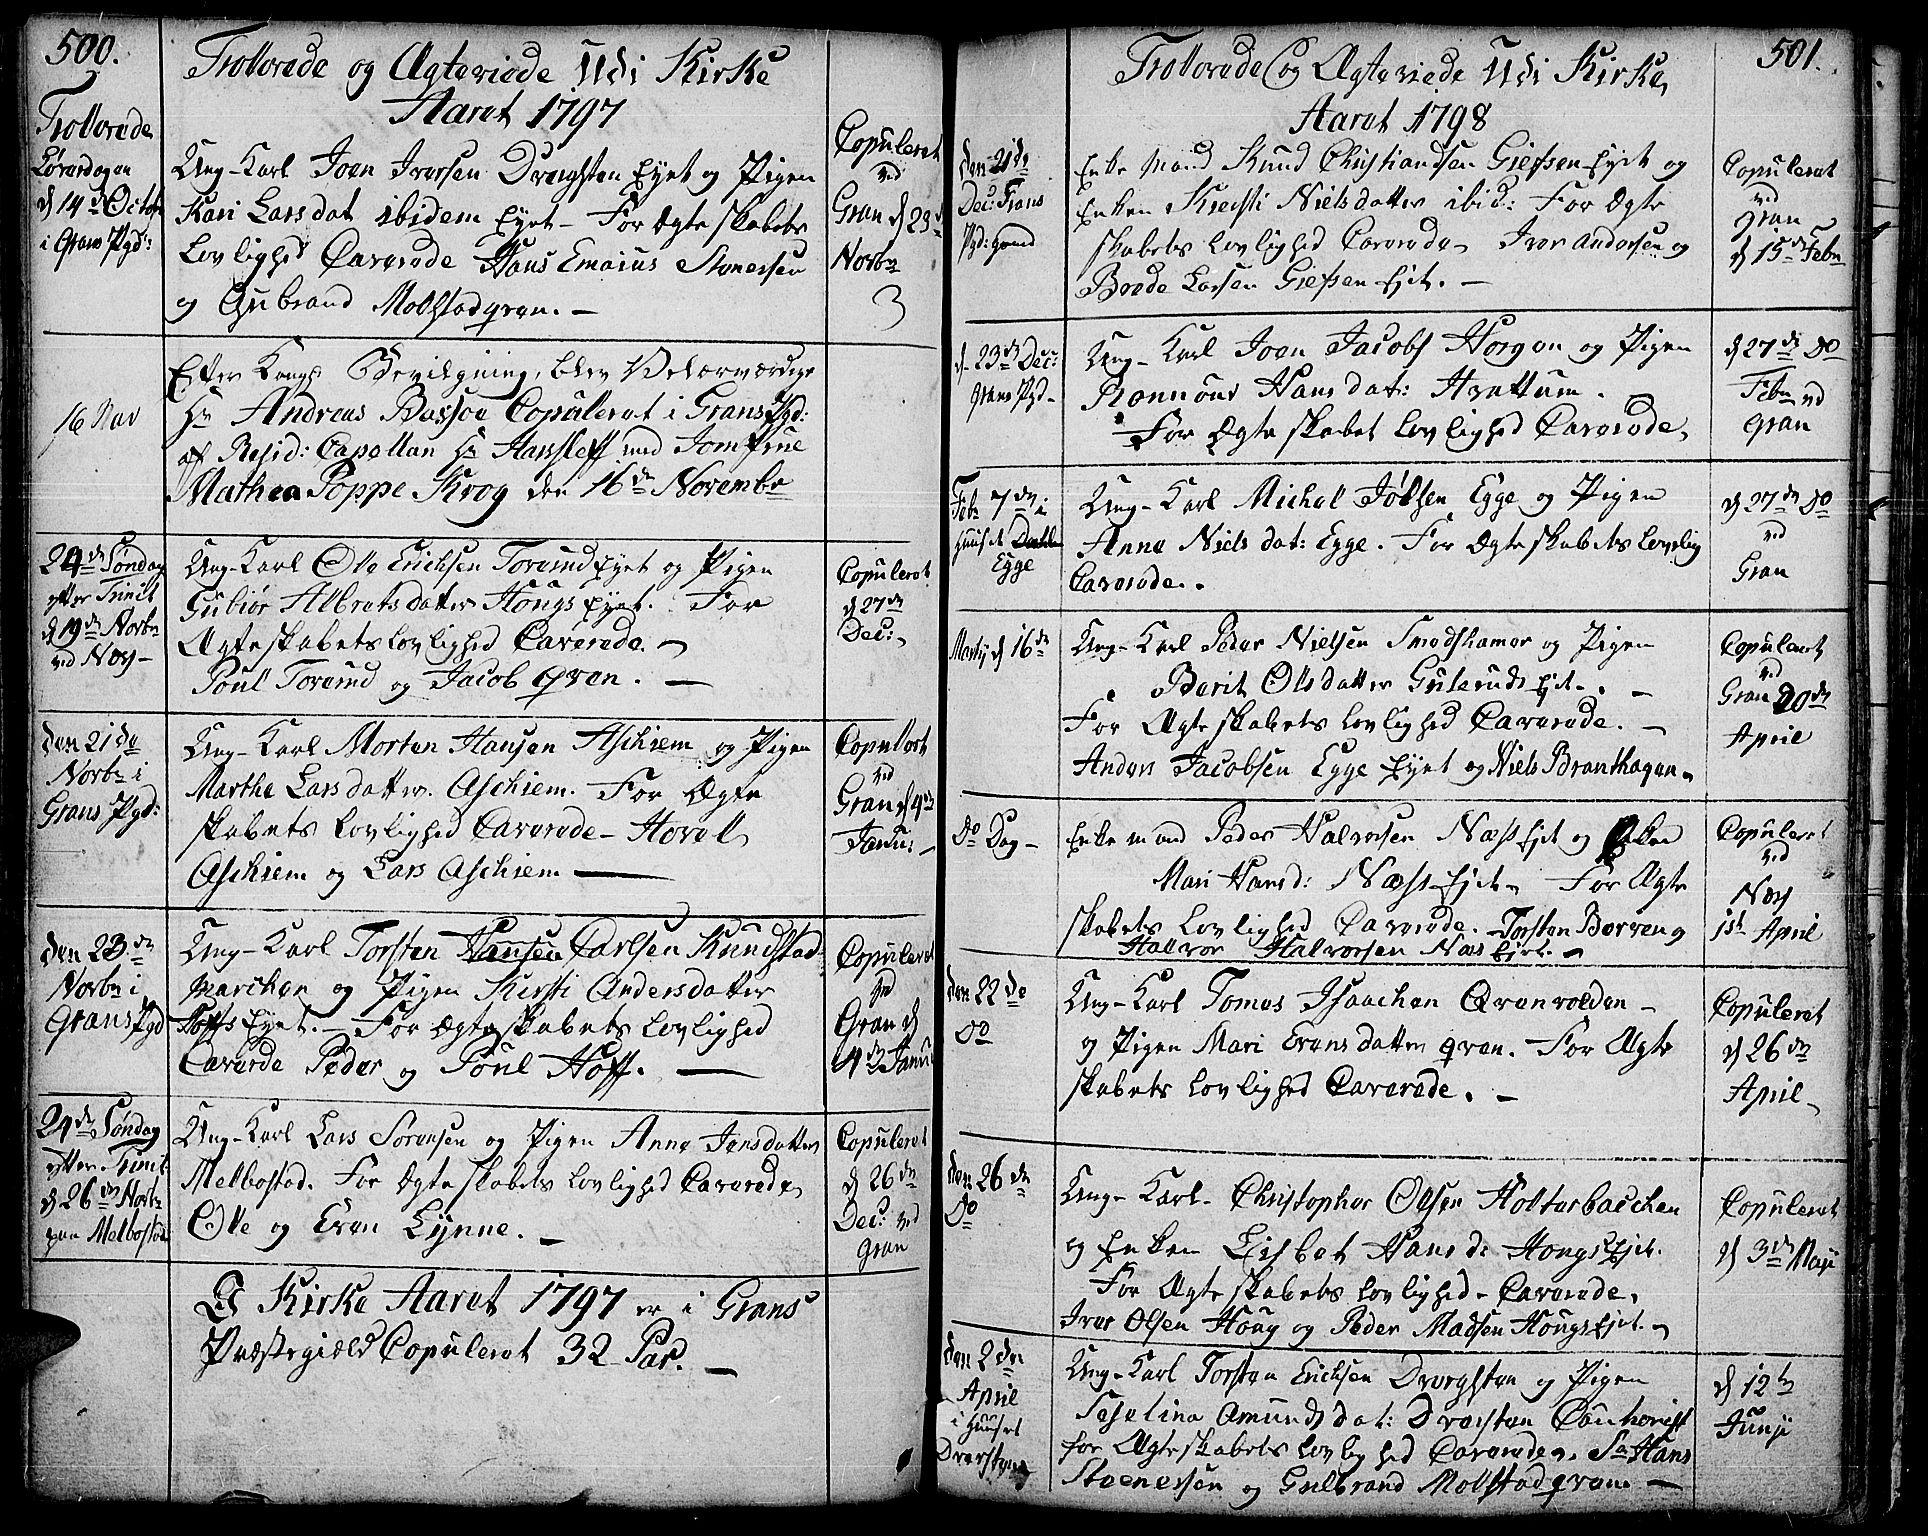 SAH, Gran prestekontor, Ministerialbok nr. 6, 1787-1824, s. 500-501